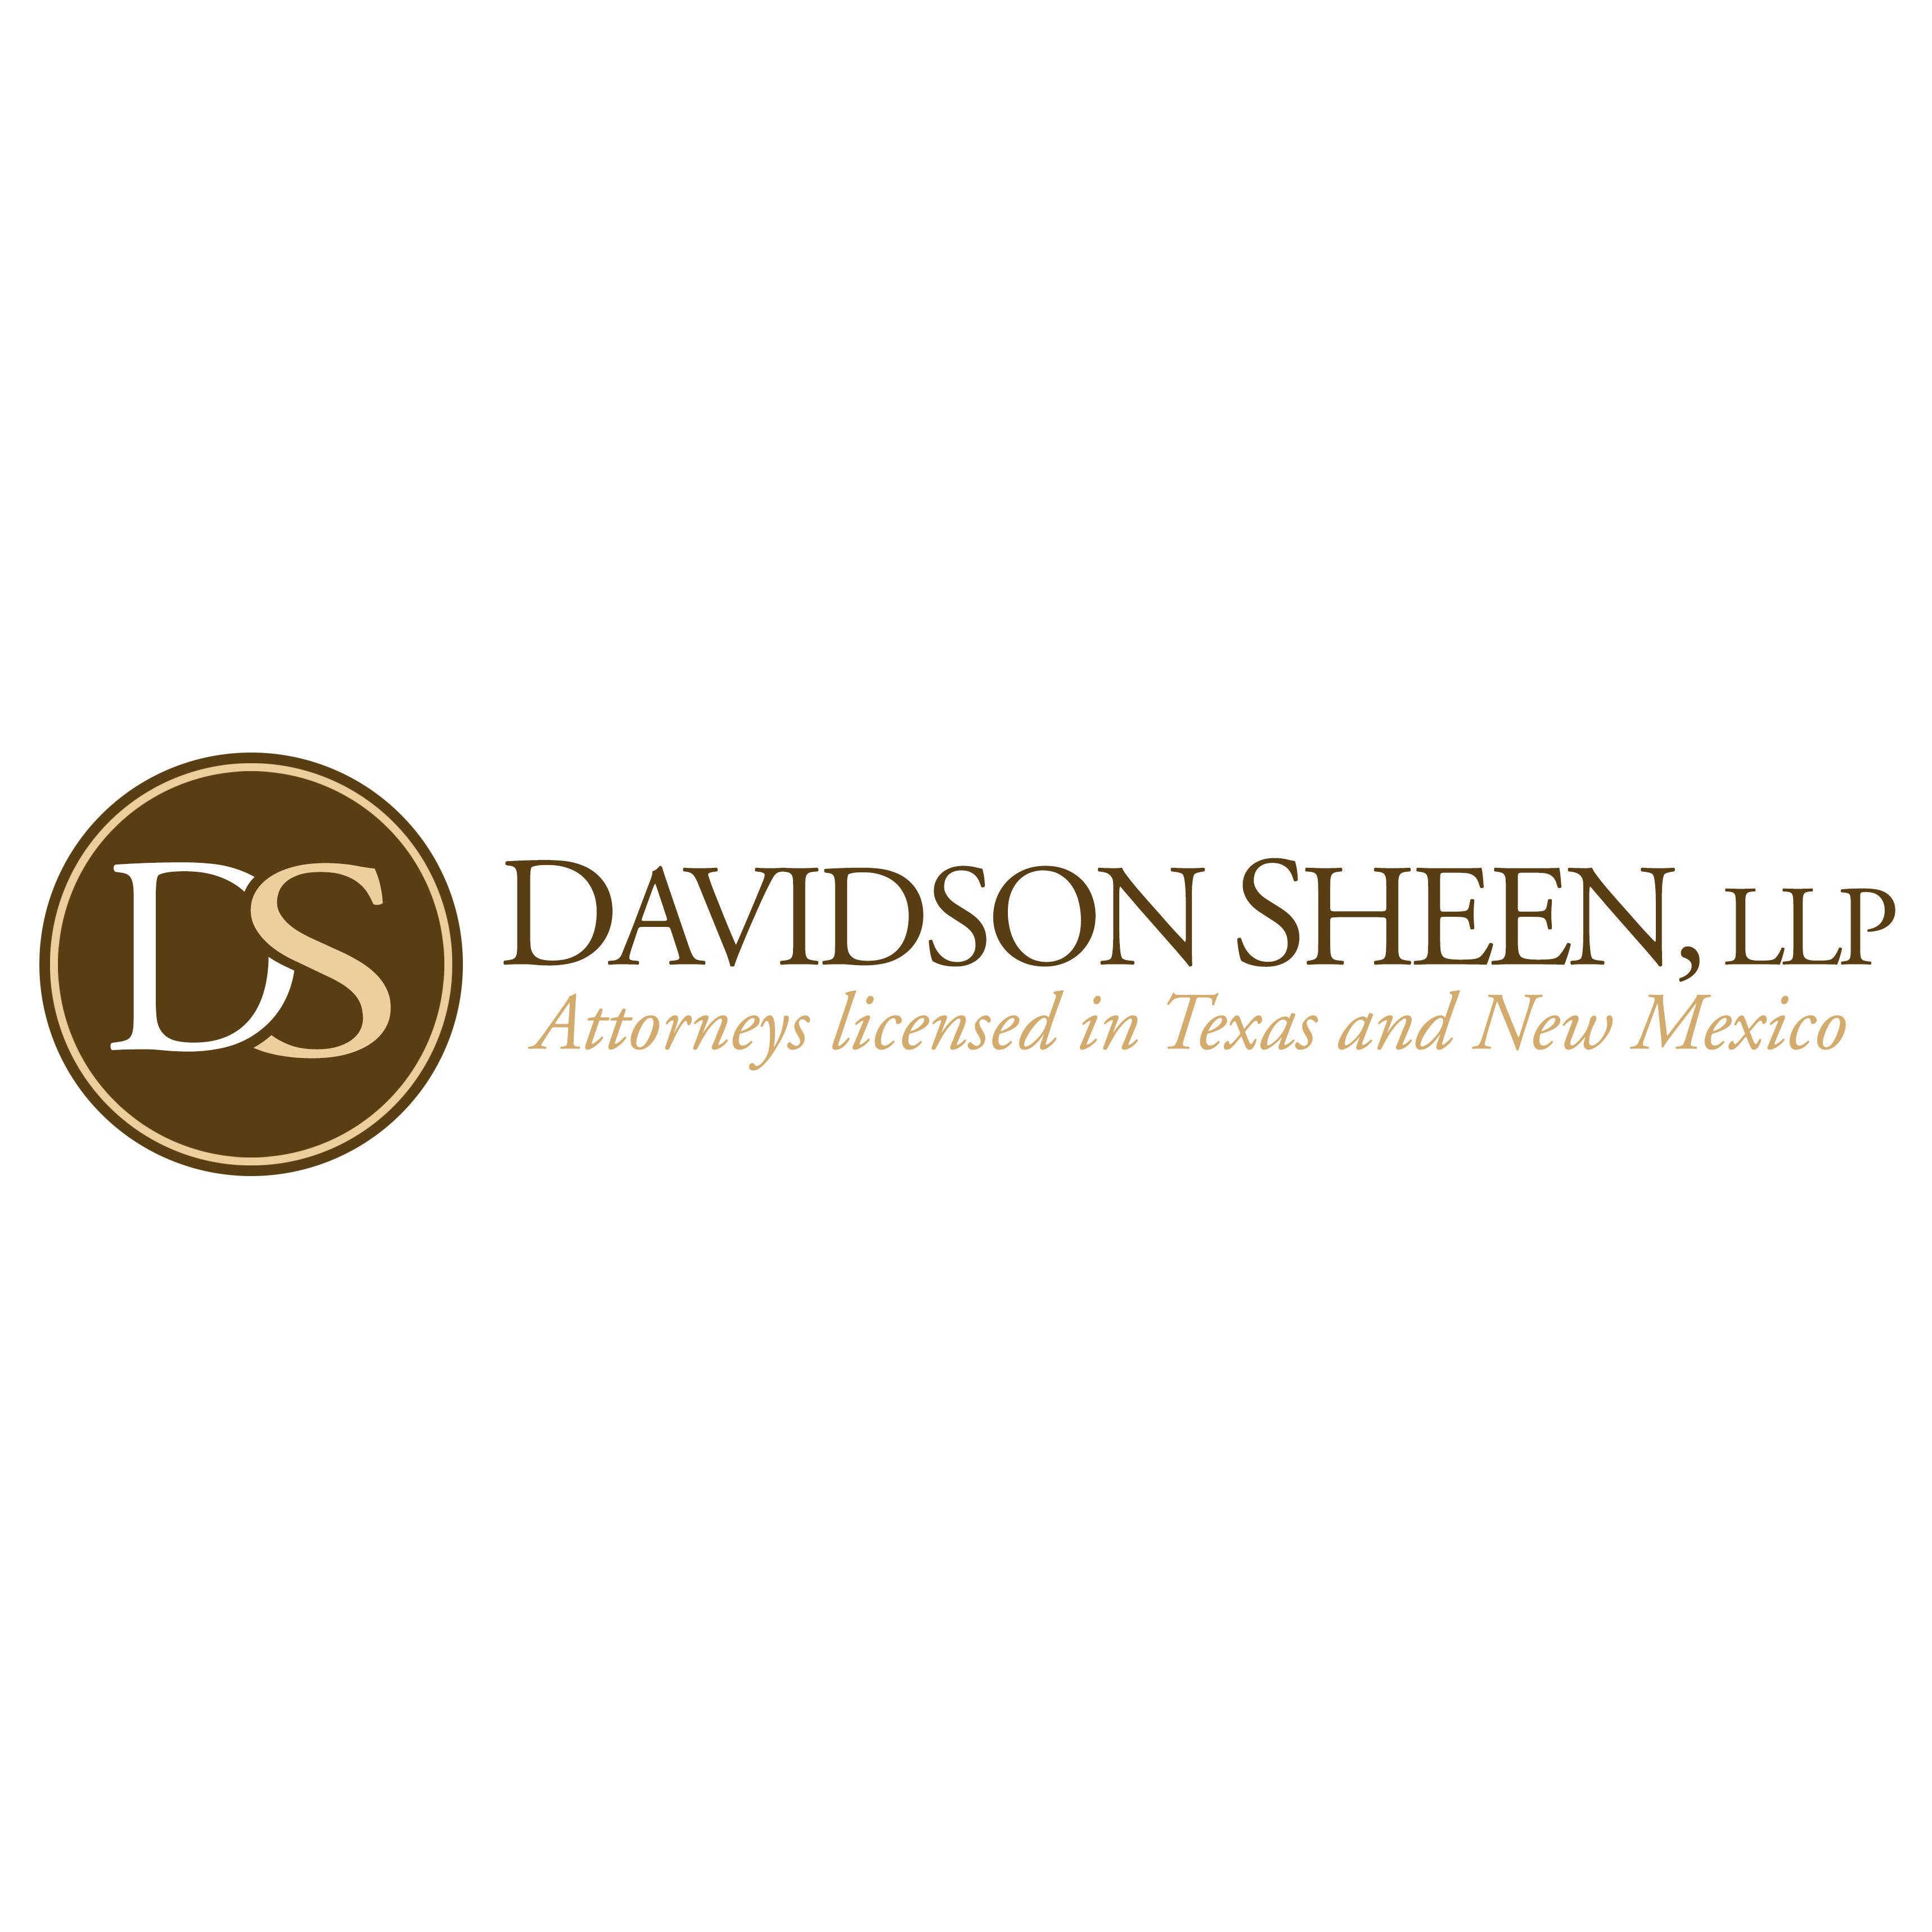 Davidson Sheen, LLP